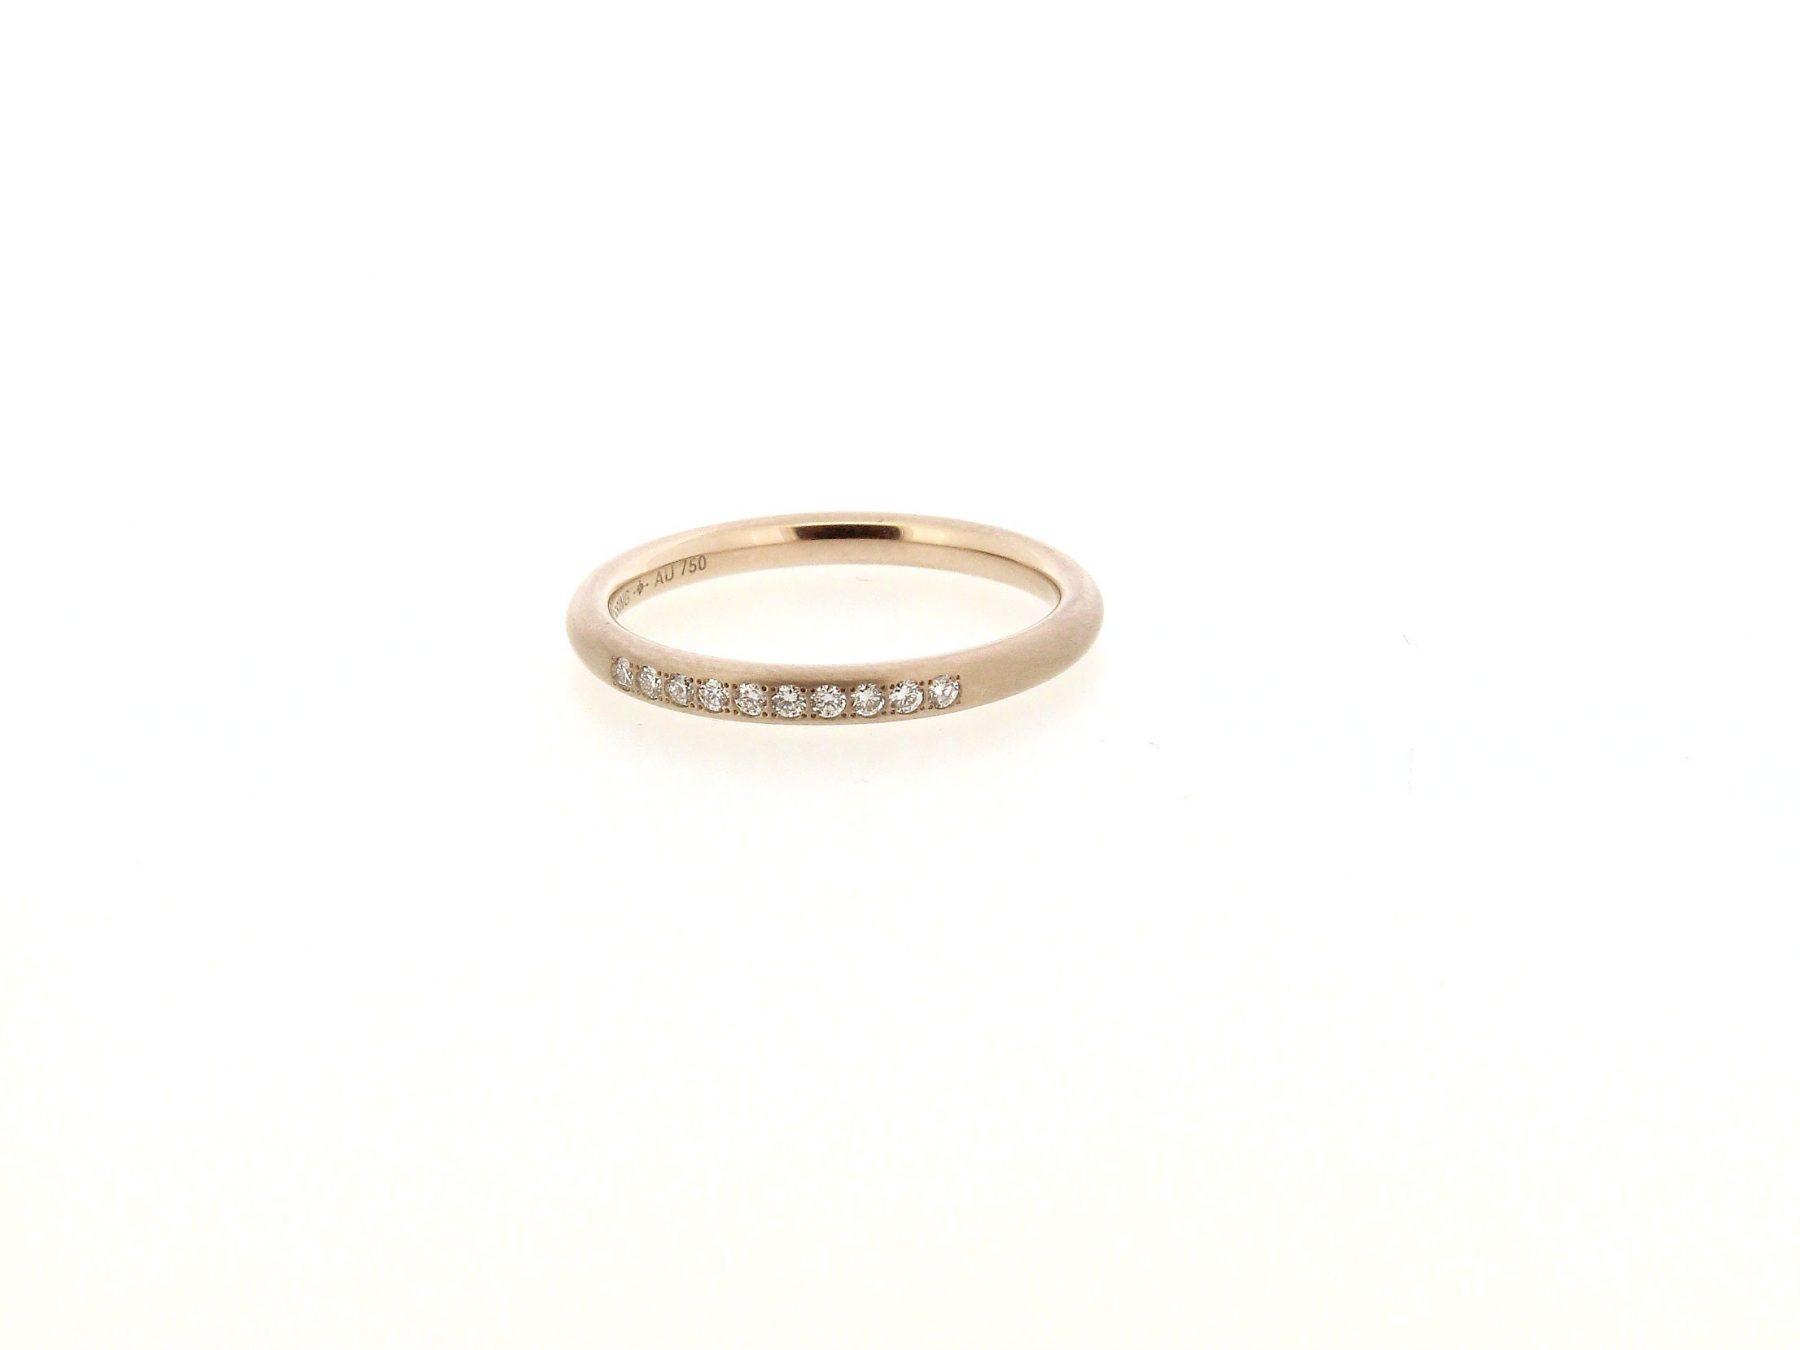 Ring Satellite Rosewood - Niessing - N321570.rw10